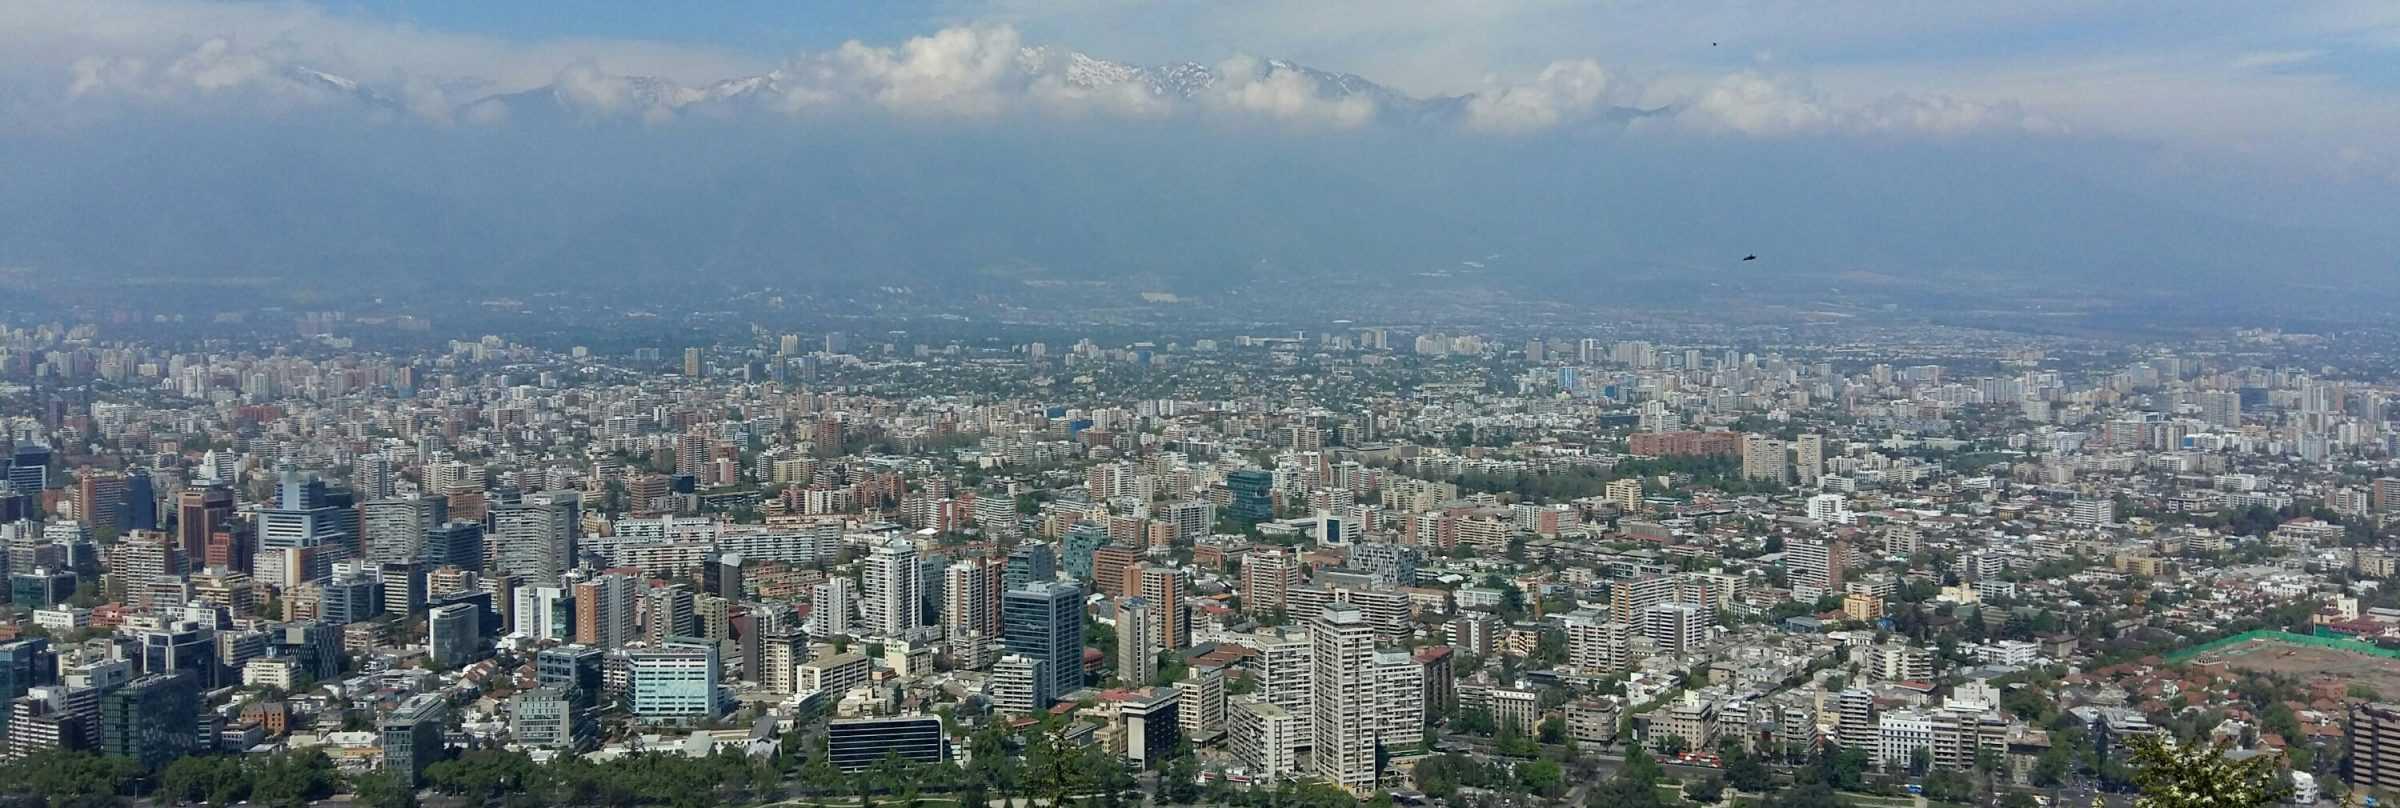 View from Cerro San Cristobal, Santiago de Chile